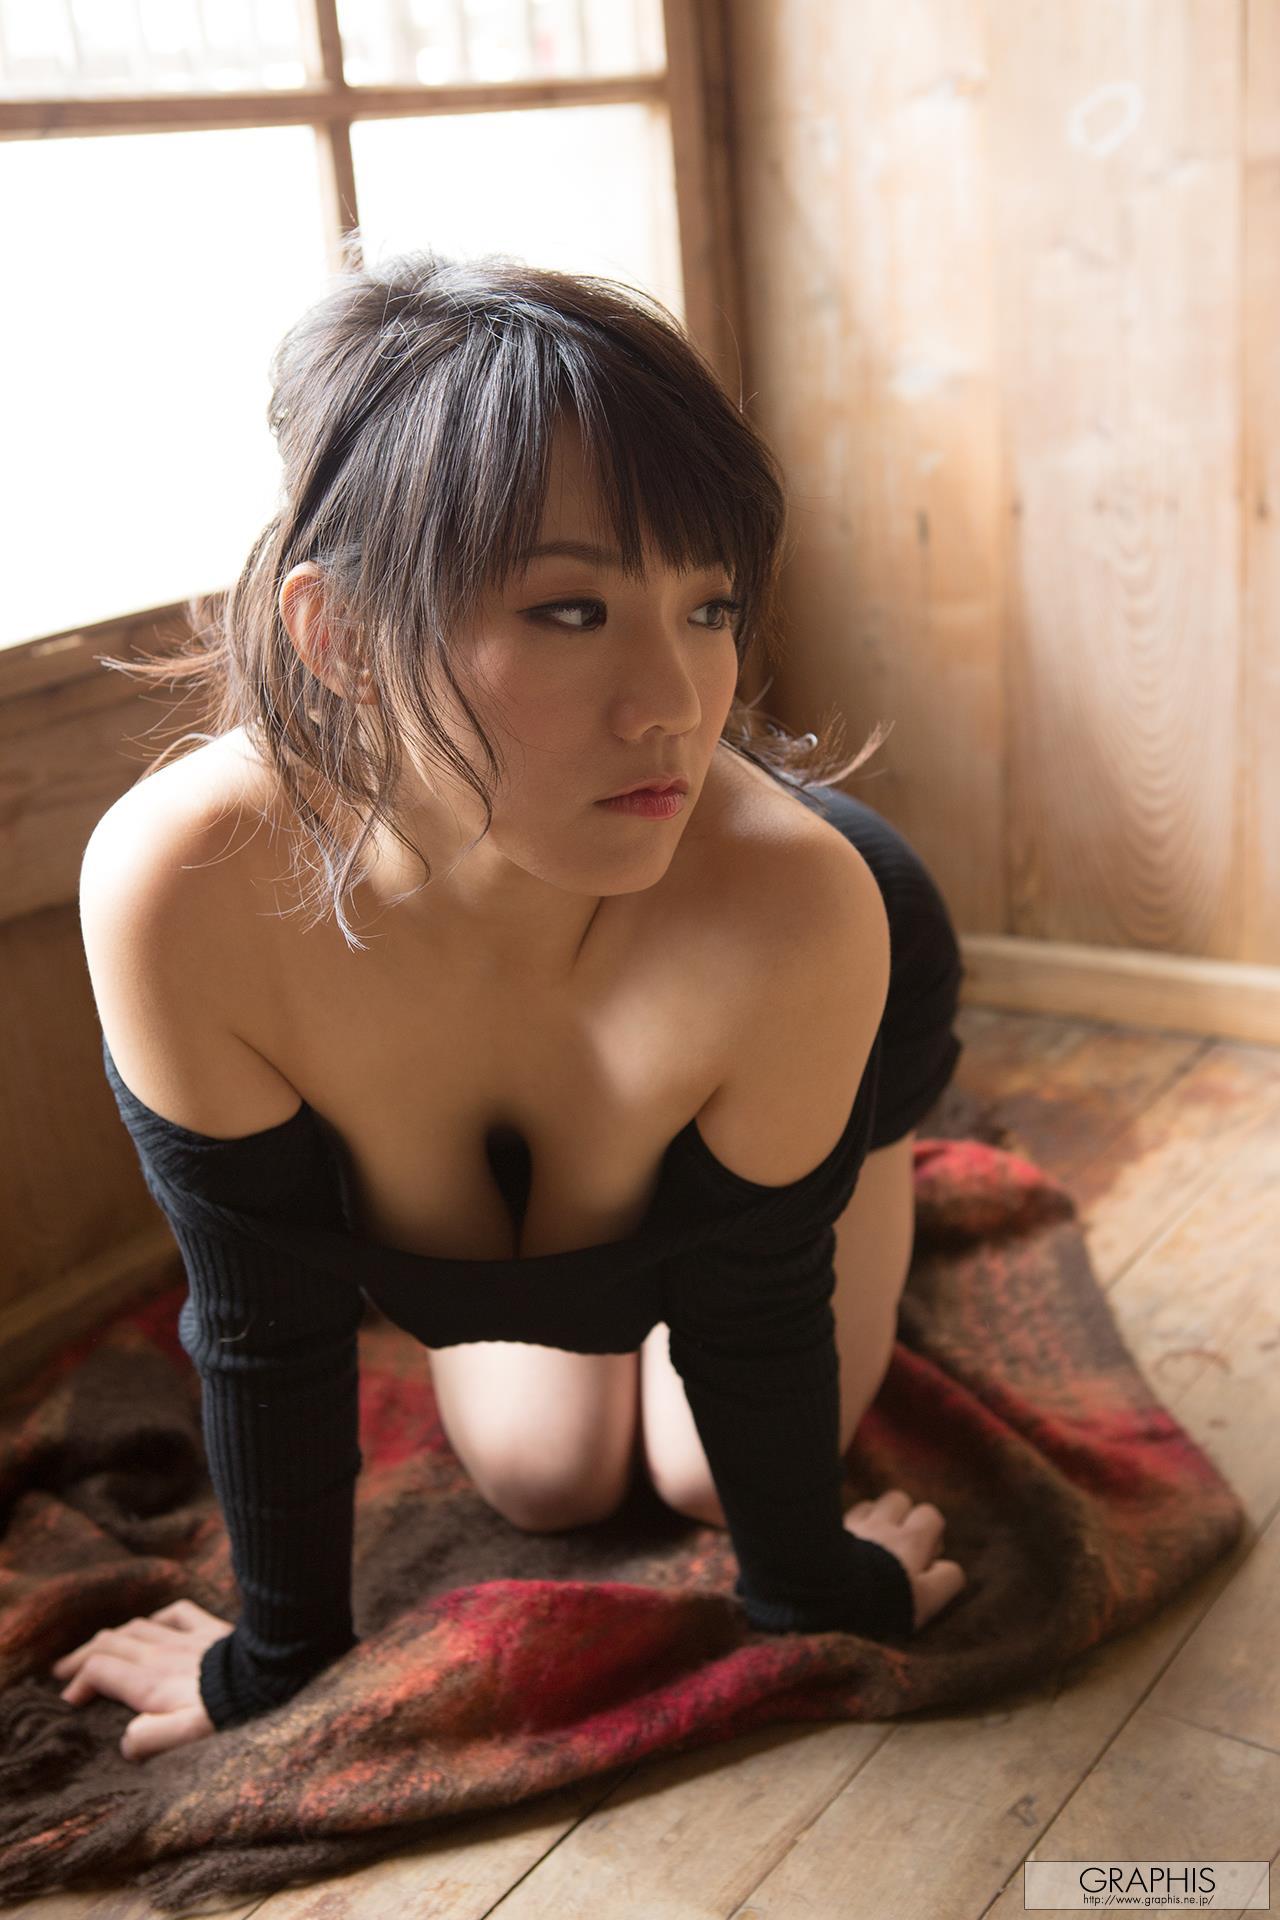 gra_kaho-s095.jpg